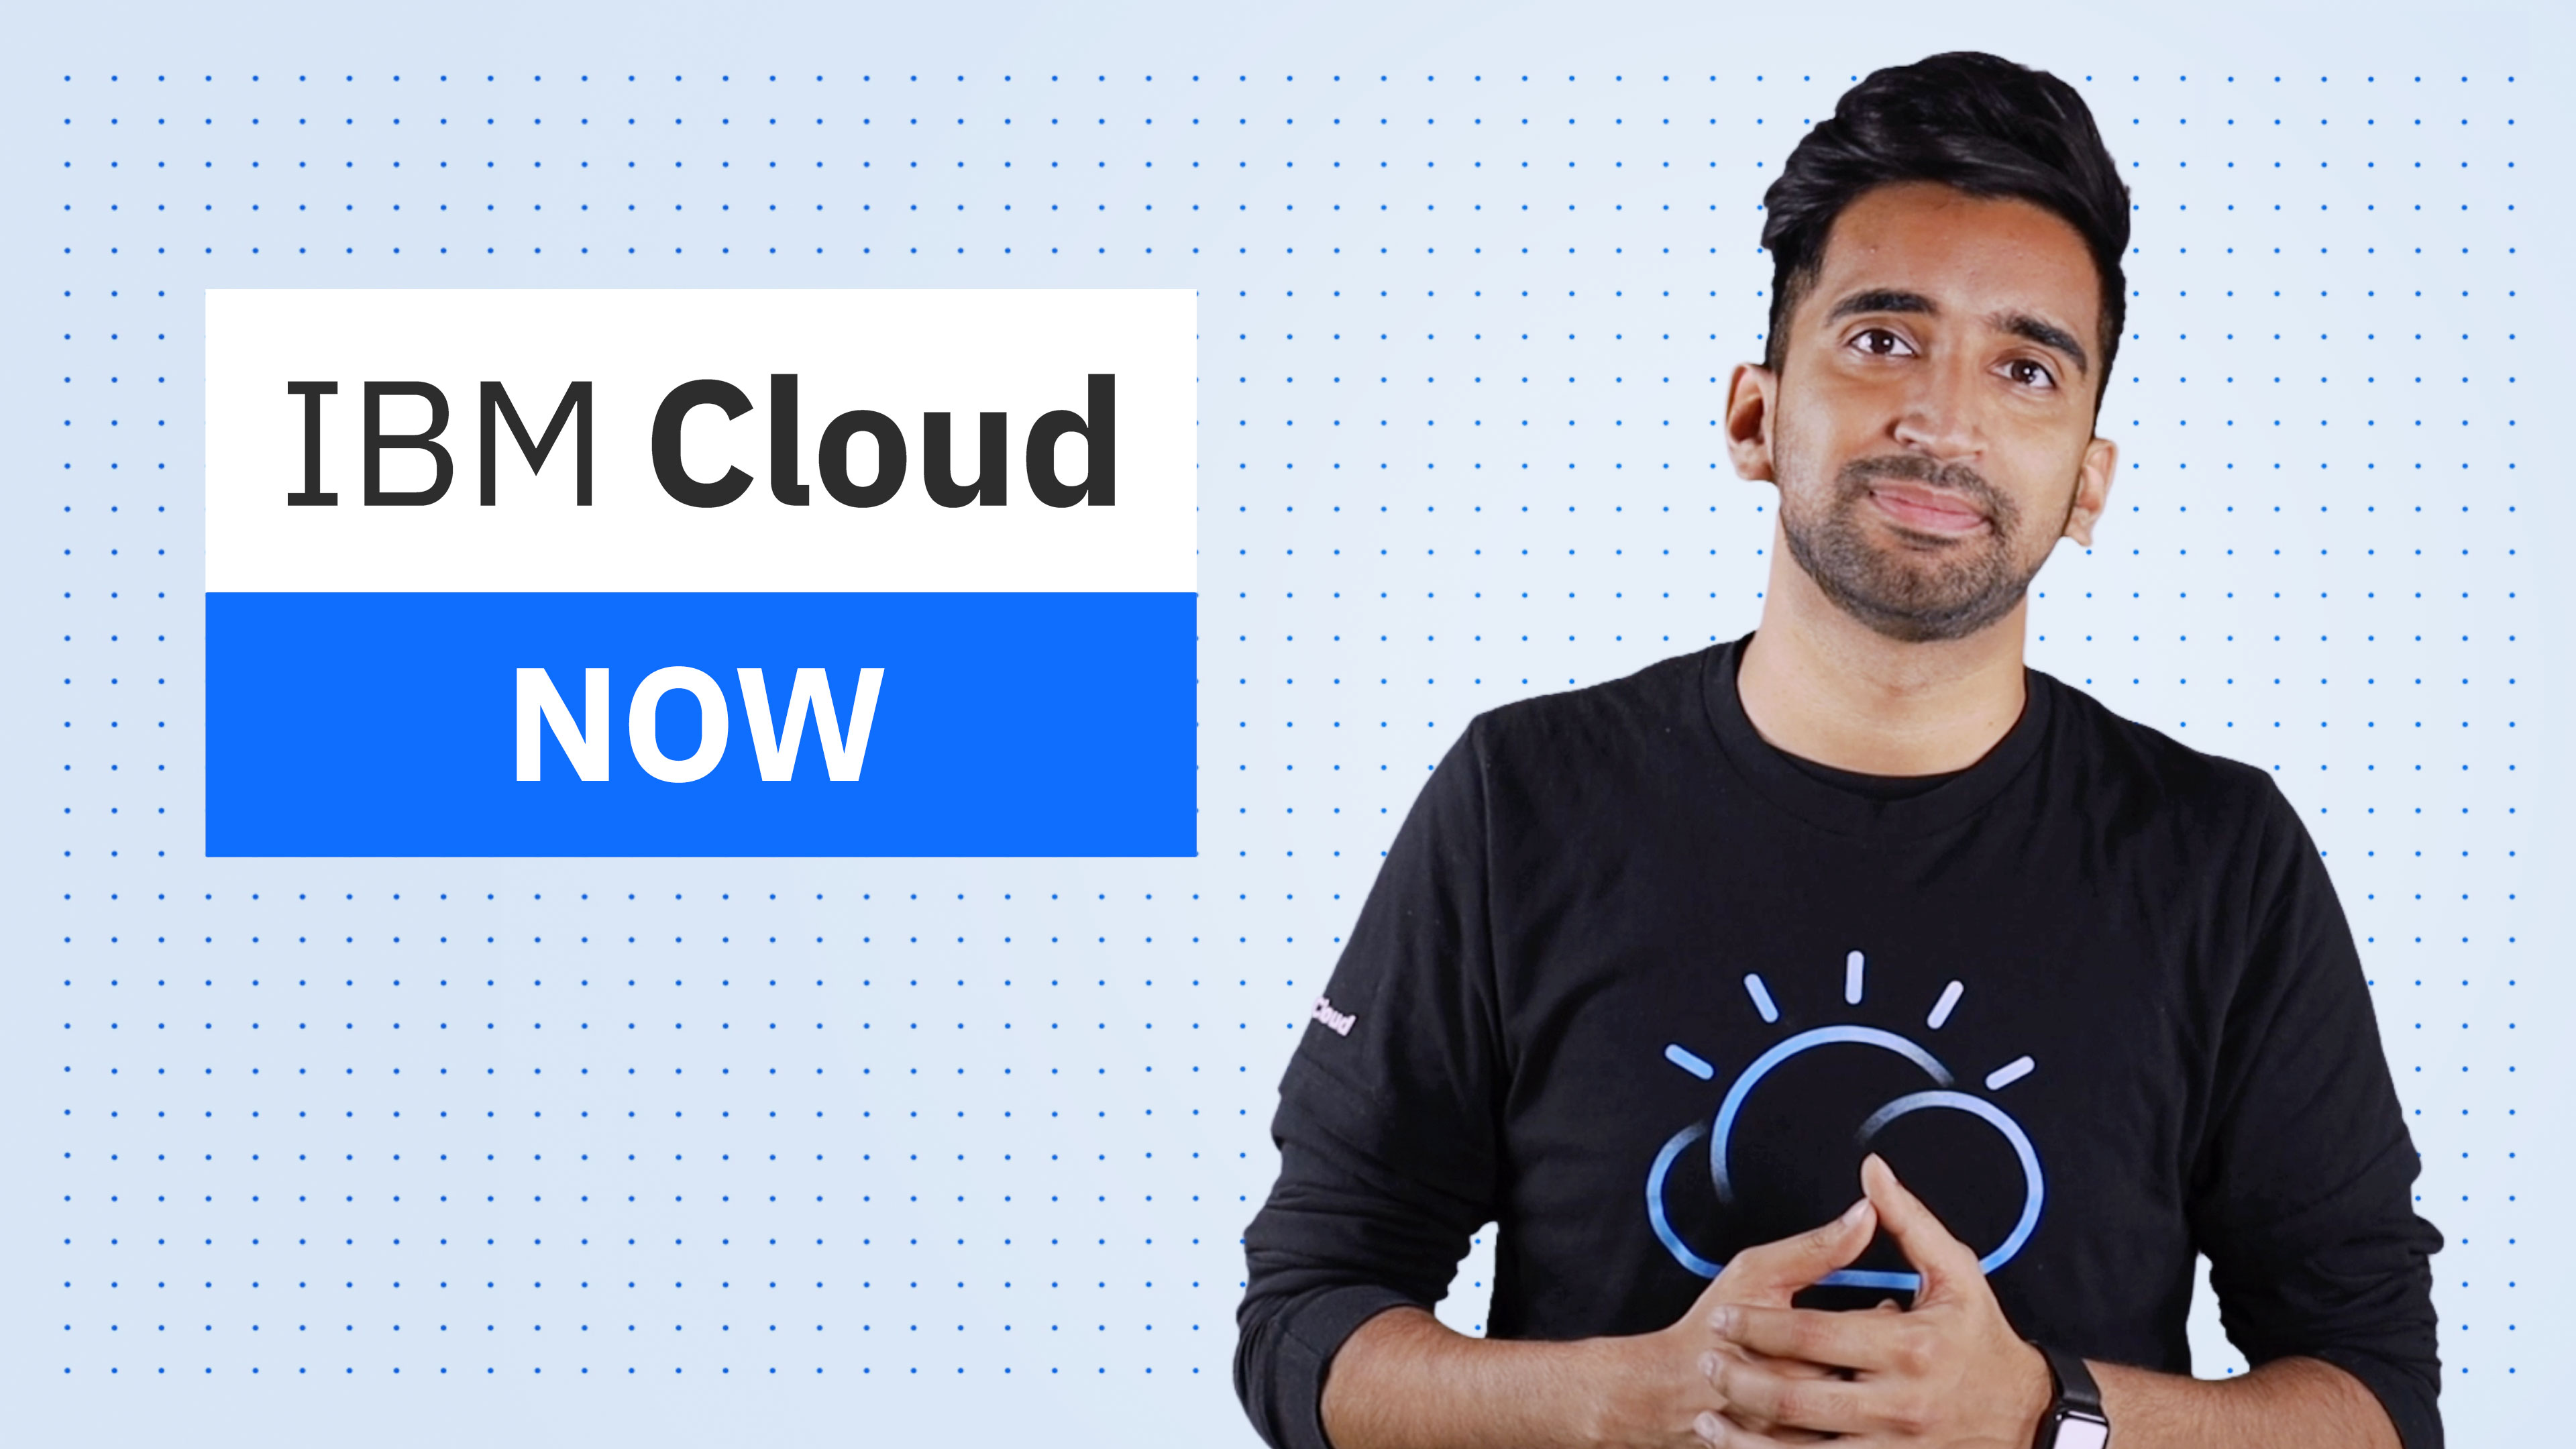 Sai Vennam, Host of IBM Cloud Now